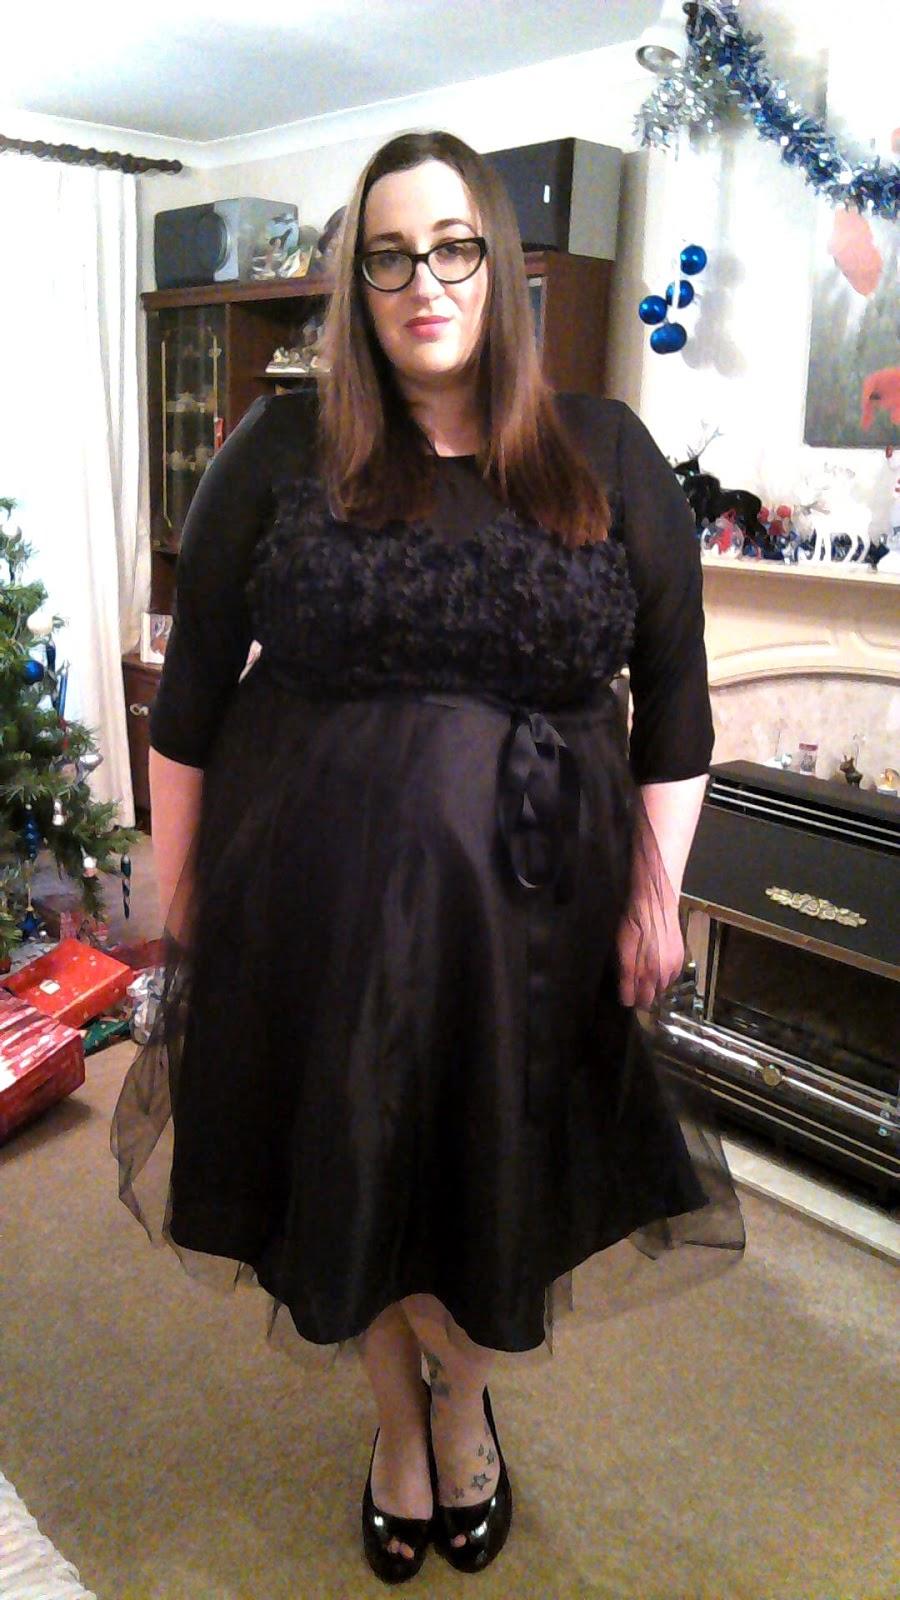 12 Days Of Christmas Dresses #11 - Does My Blog Make Me ...